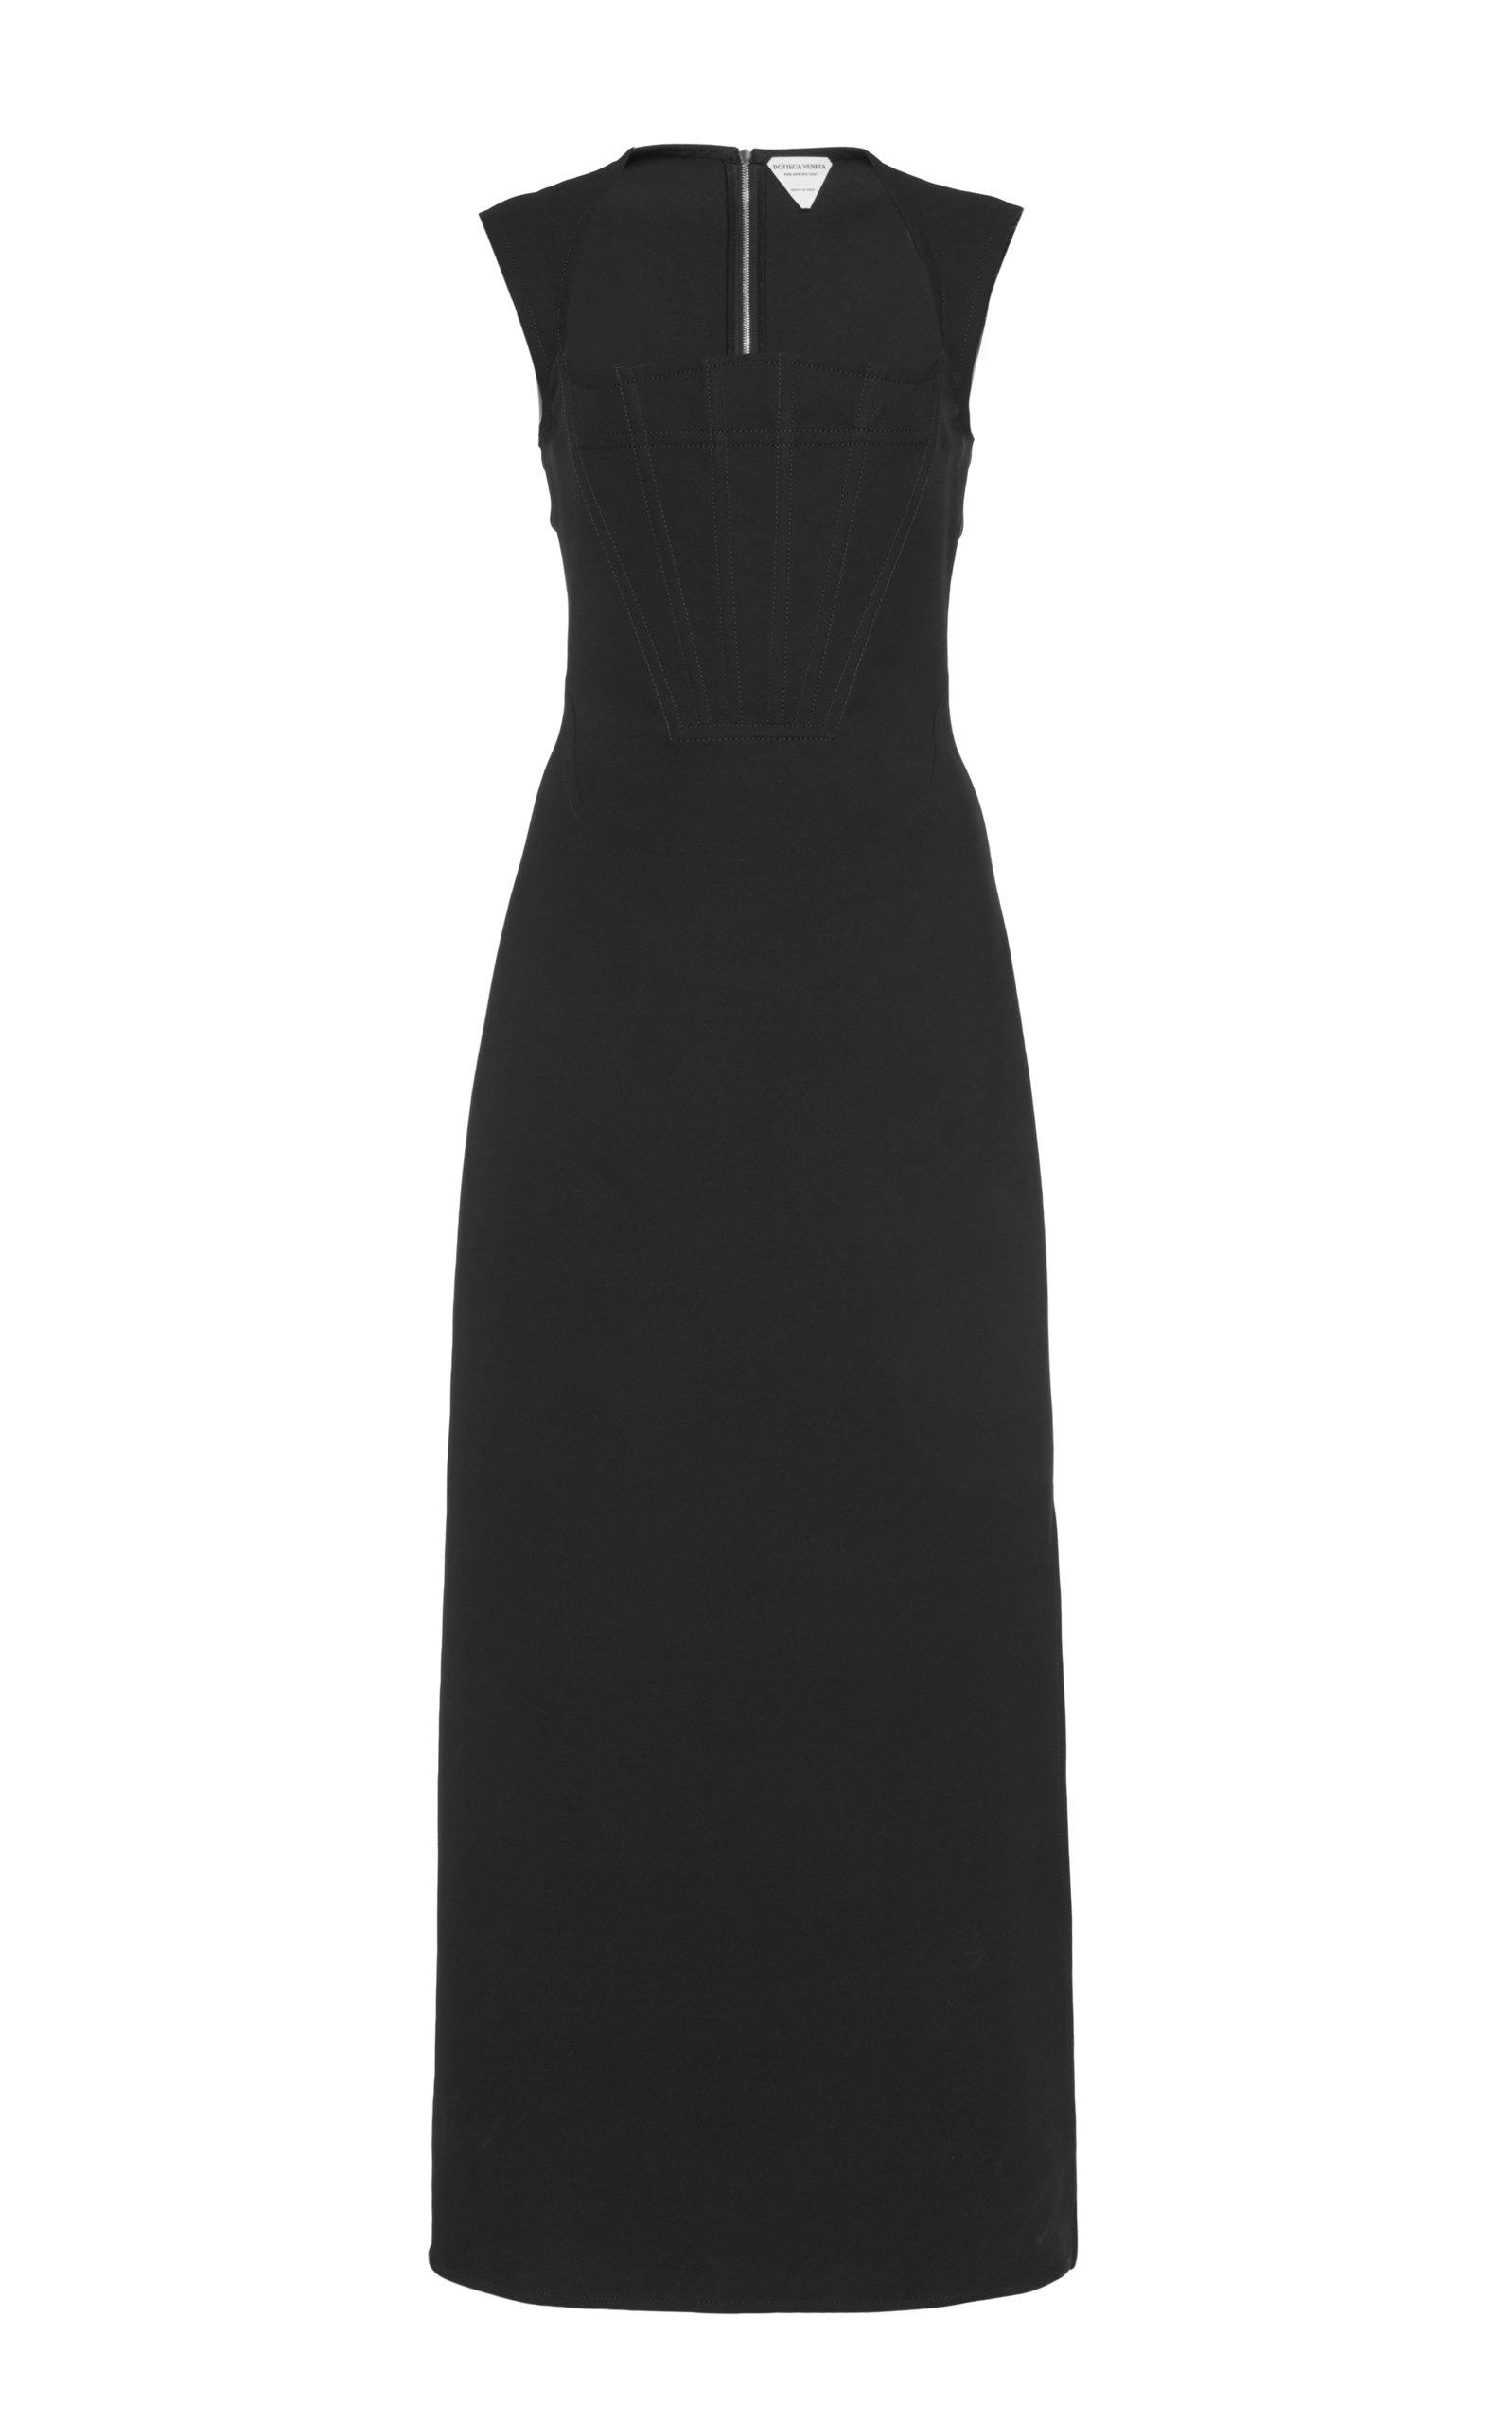 Bottega Veneta – Women's Cady Midi Dress – Black – Moda Operandi